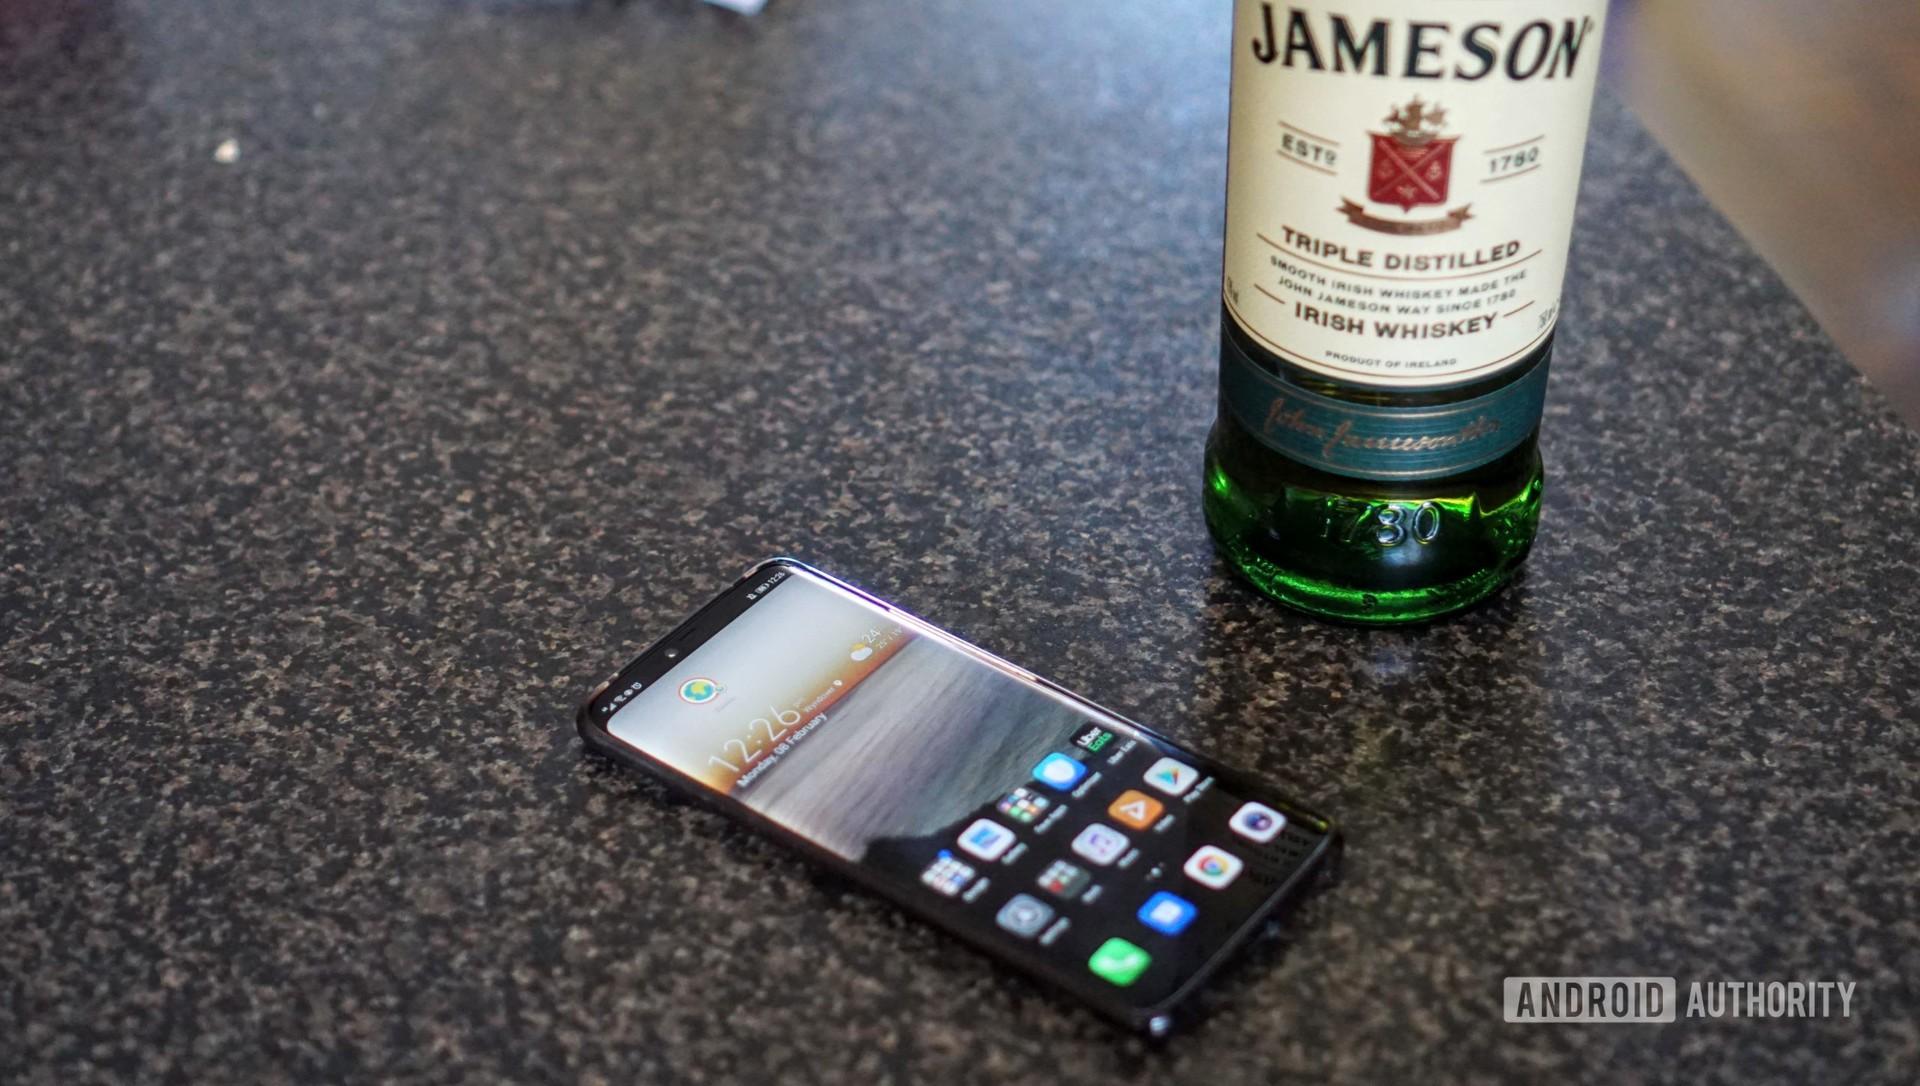 Smartphones could soon get a drunk mode.